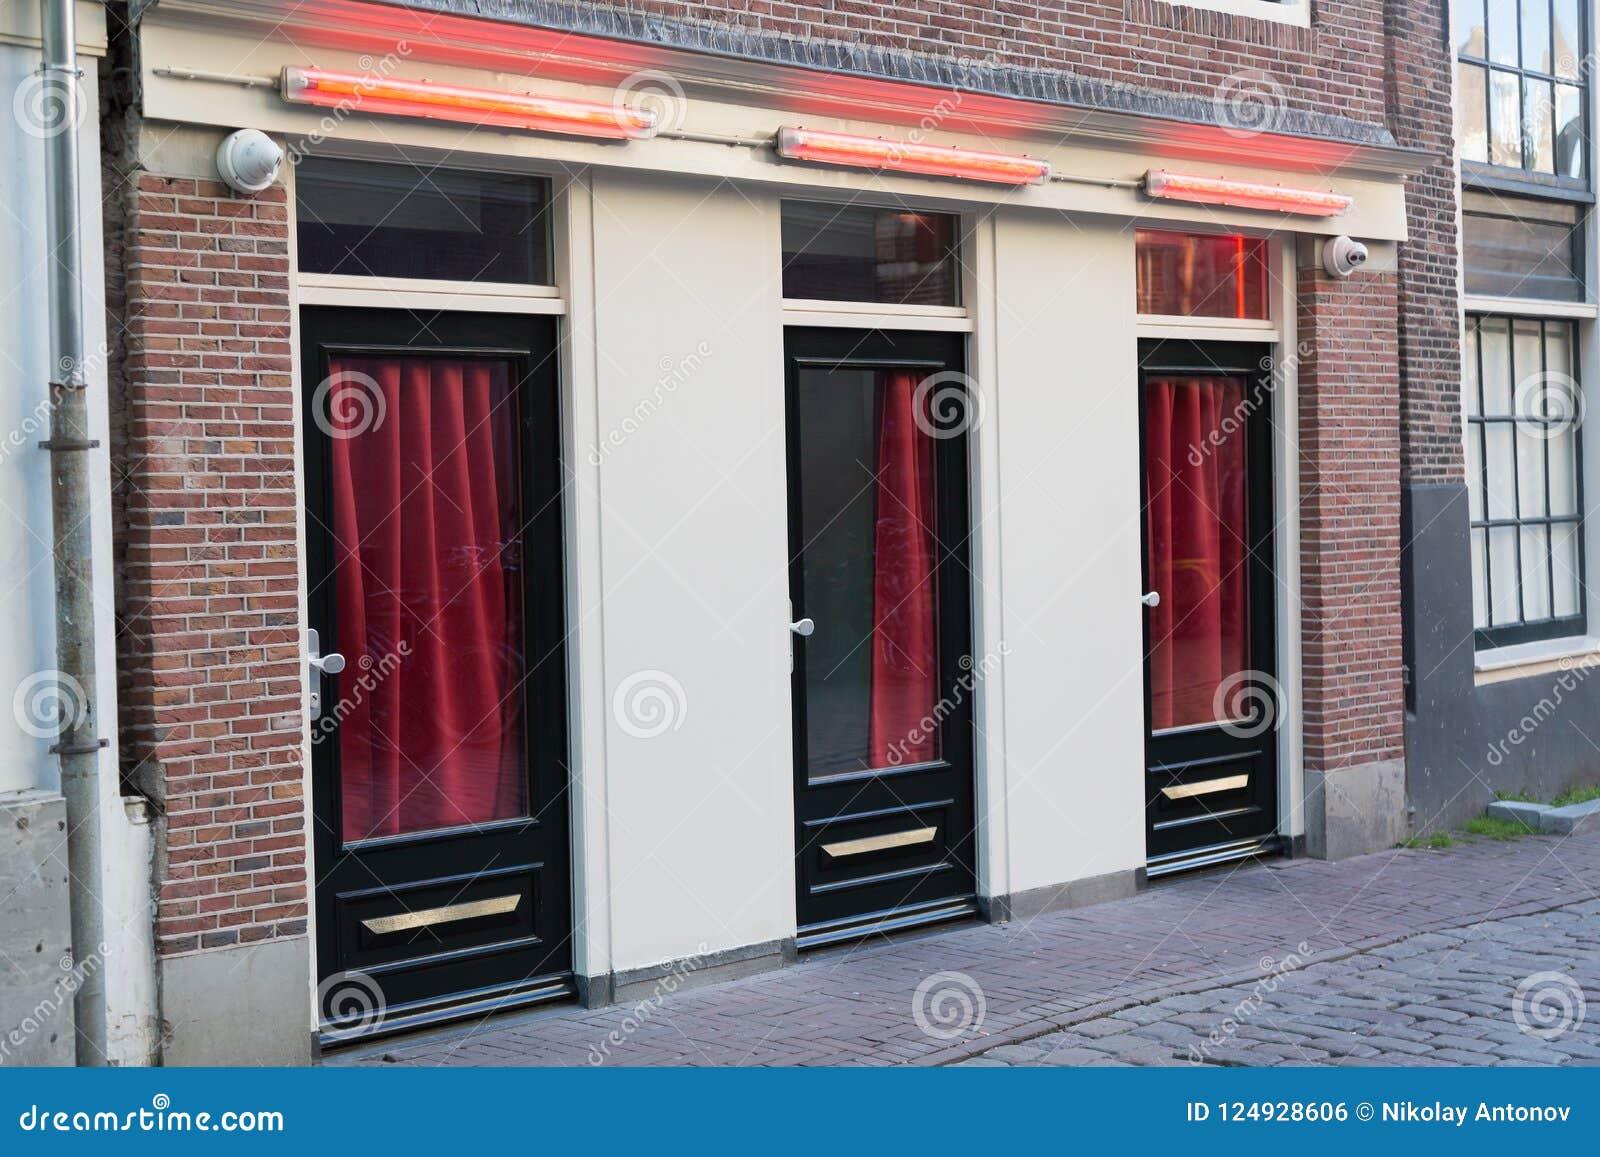 Light district red amsterdam prostitutes Baltimore Sun